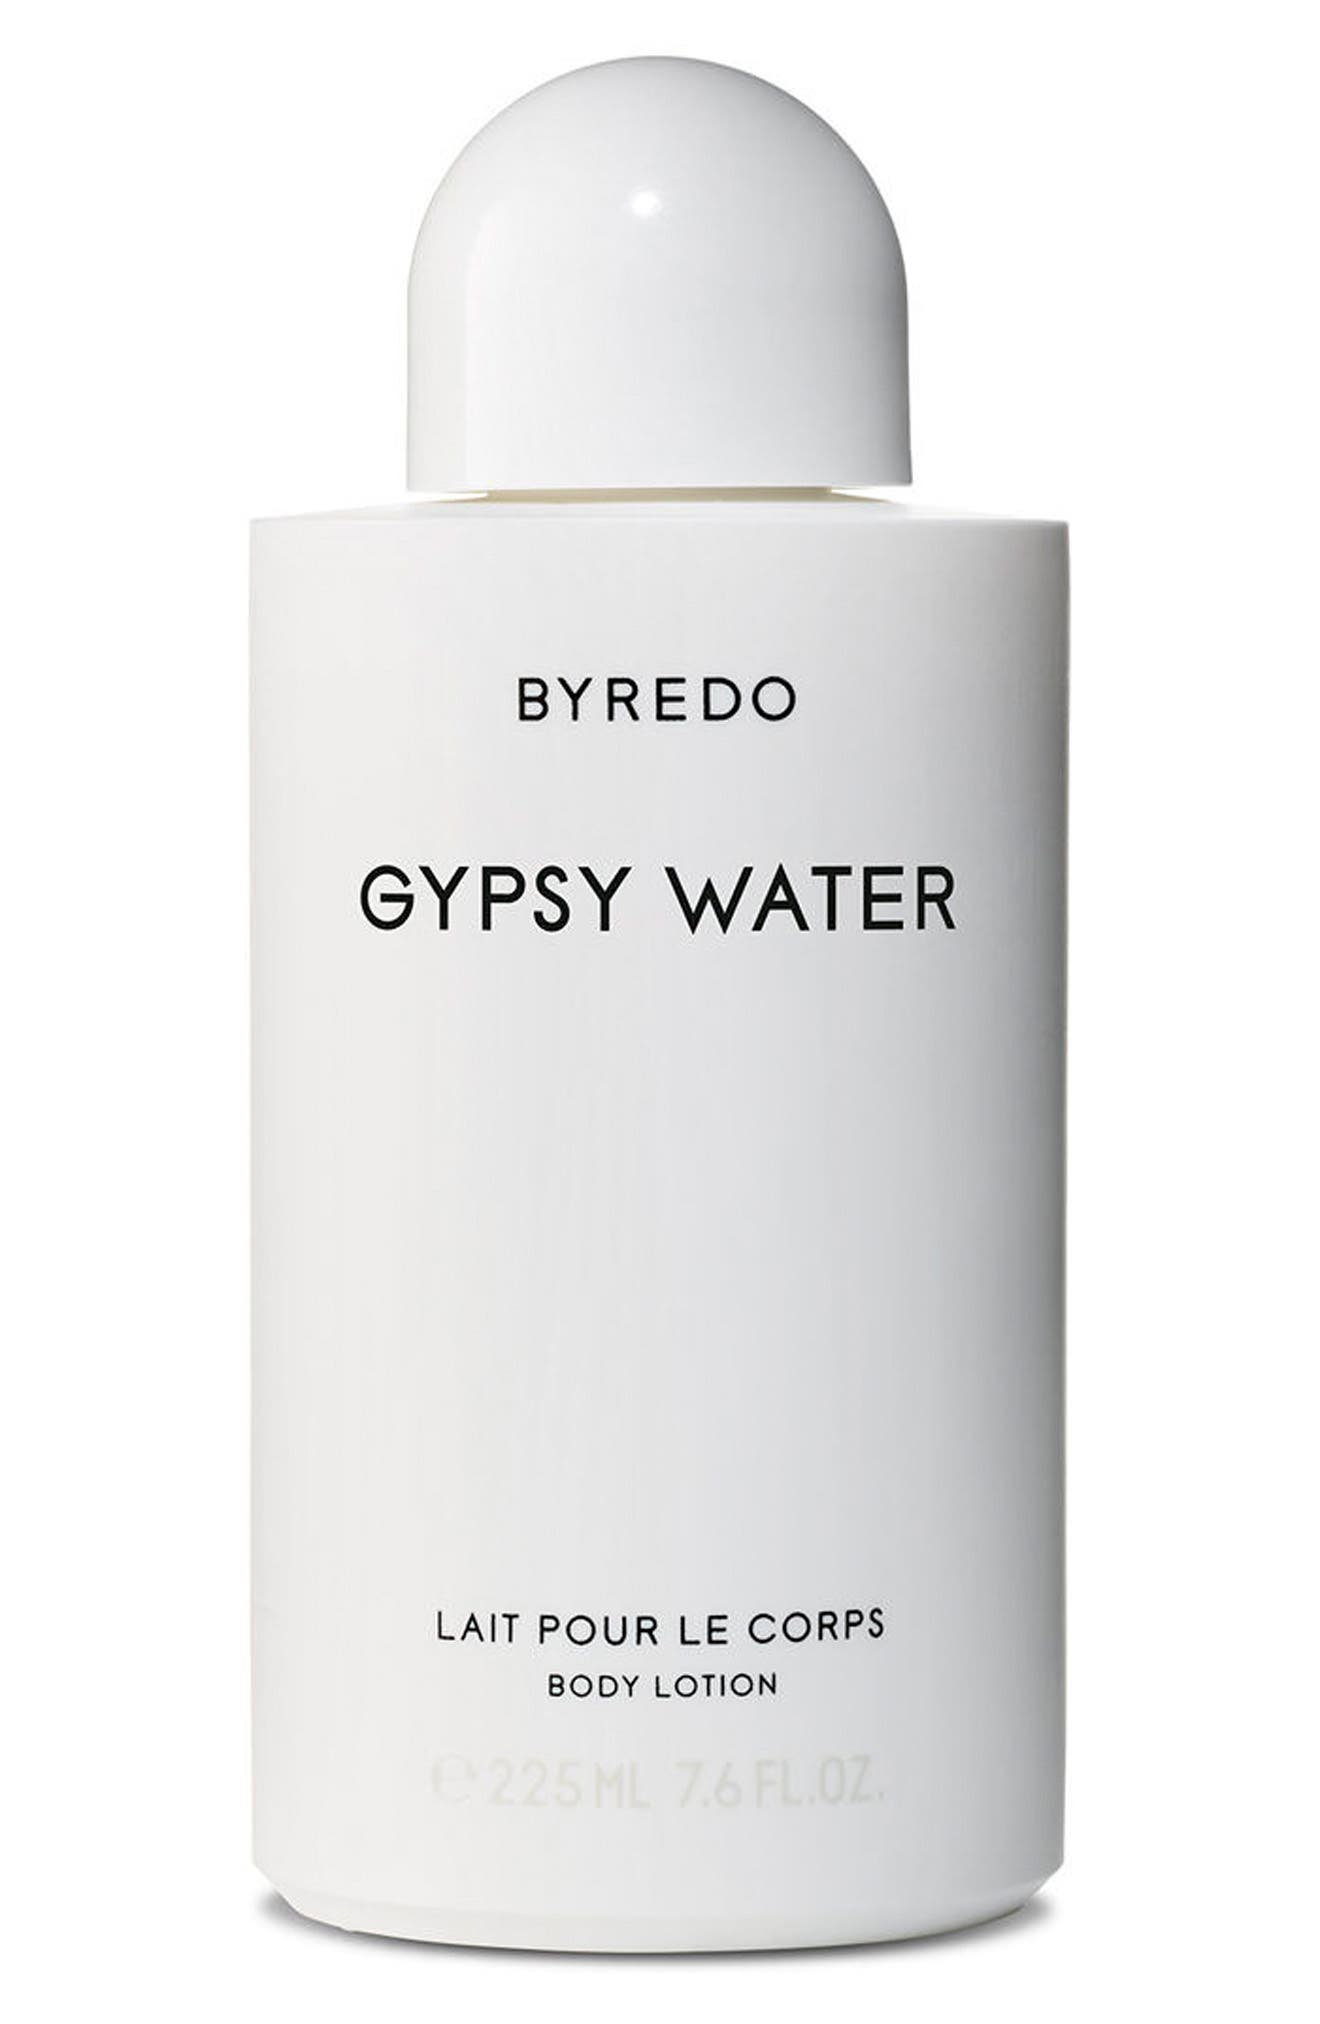 BYREDO Gypsy Water Body Lotion